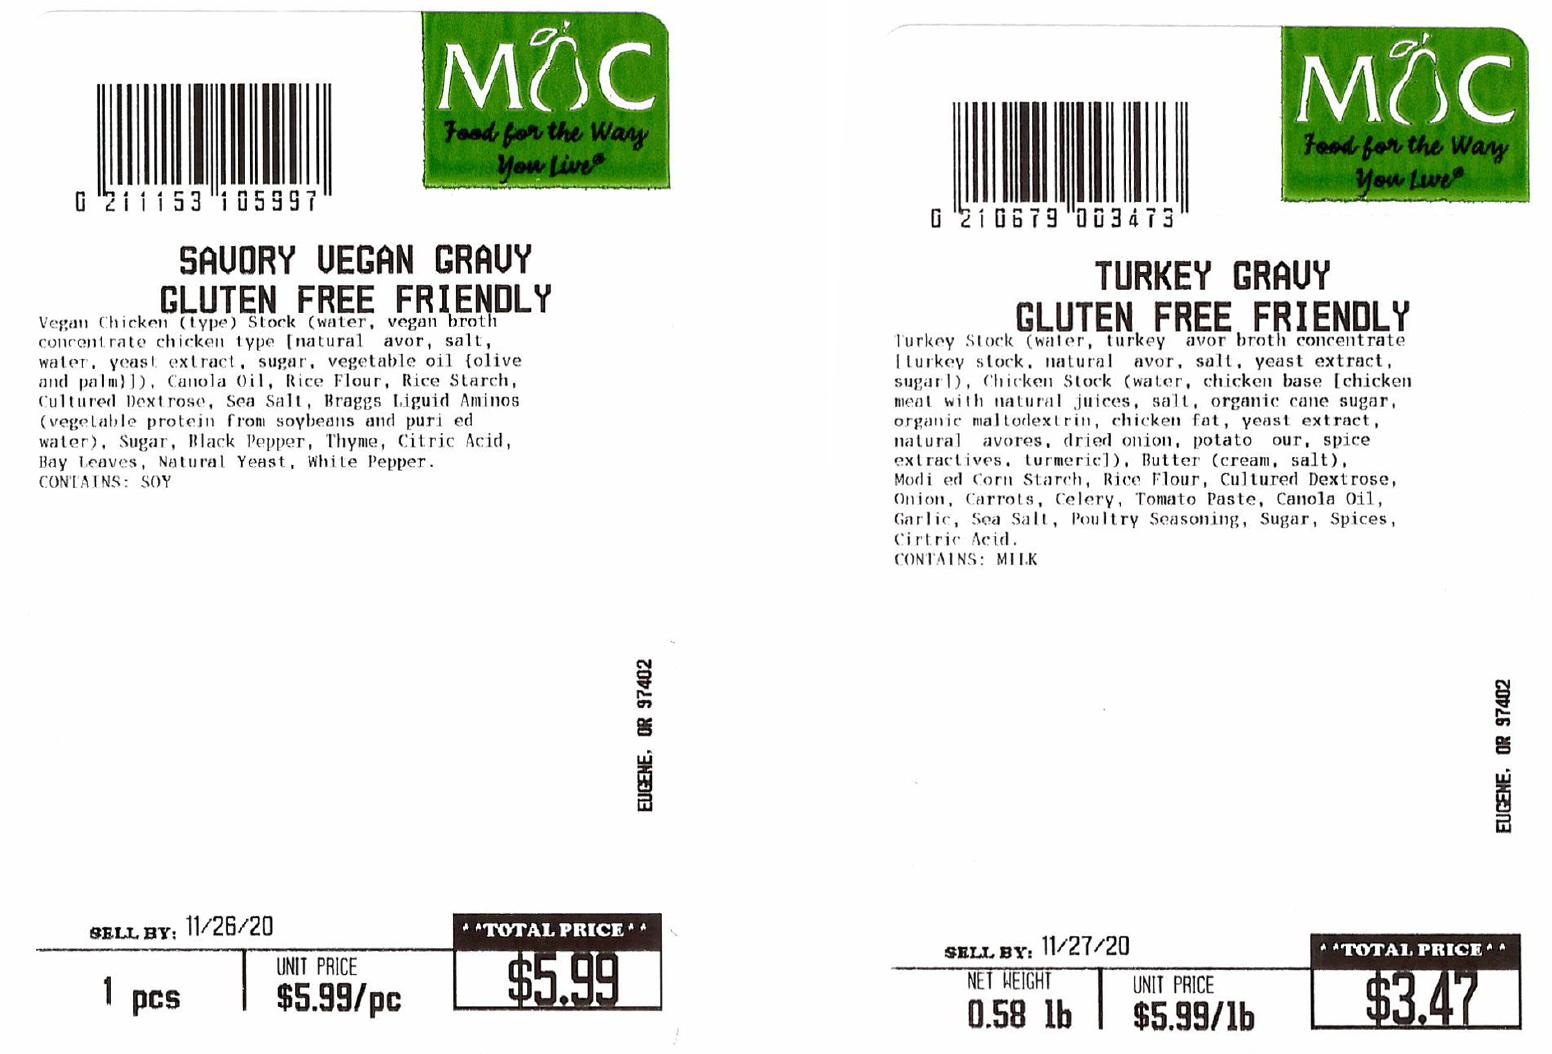 Turkey Gravy Recall Label